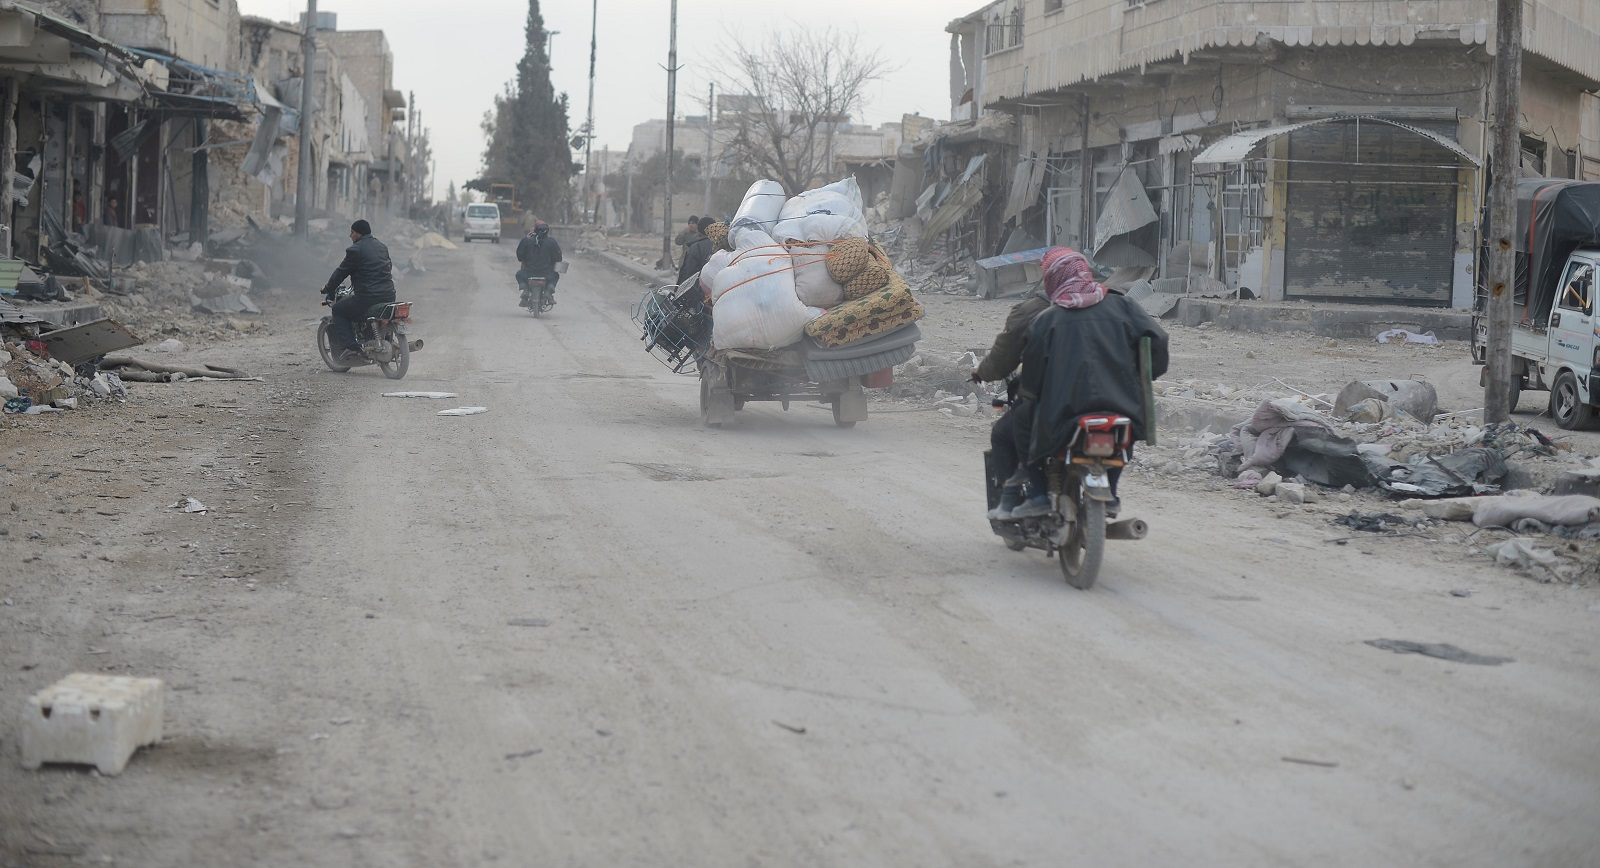 Syrians returning to Aleppo (Photo: Huseyin Nasir/Anadolu Agency/Getty Images)